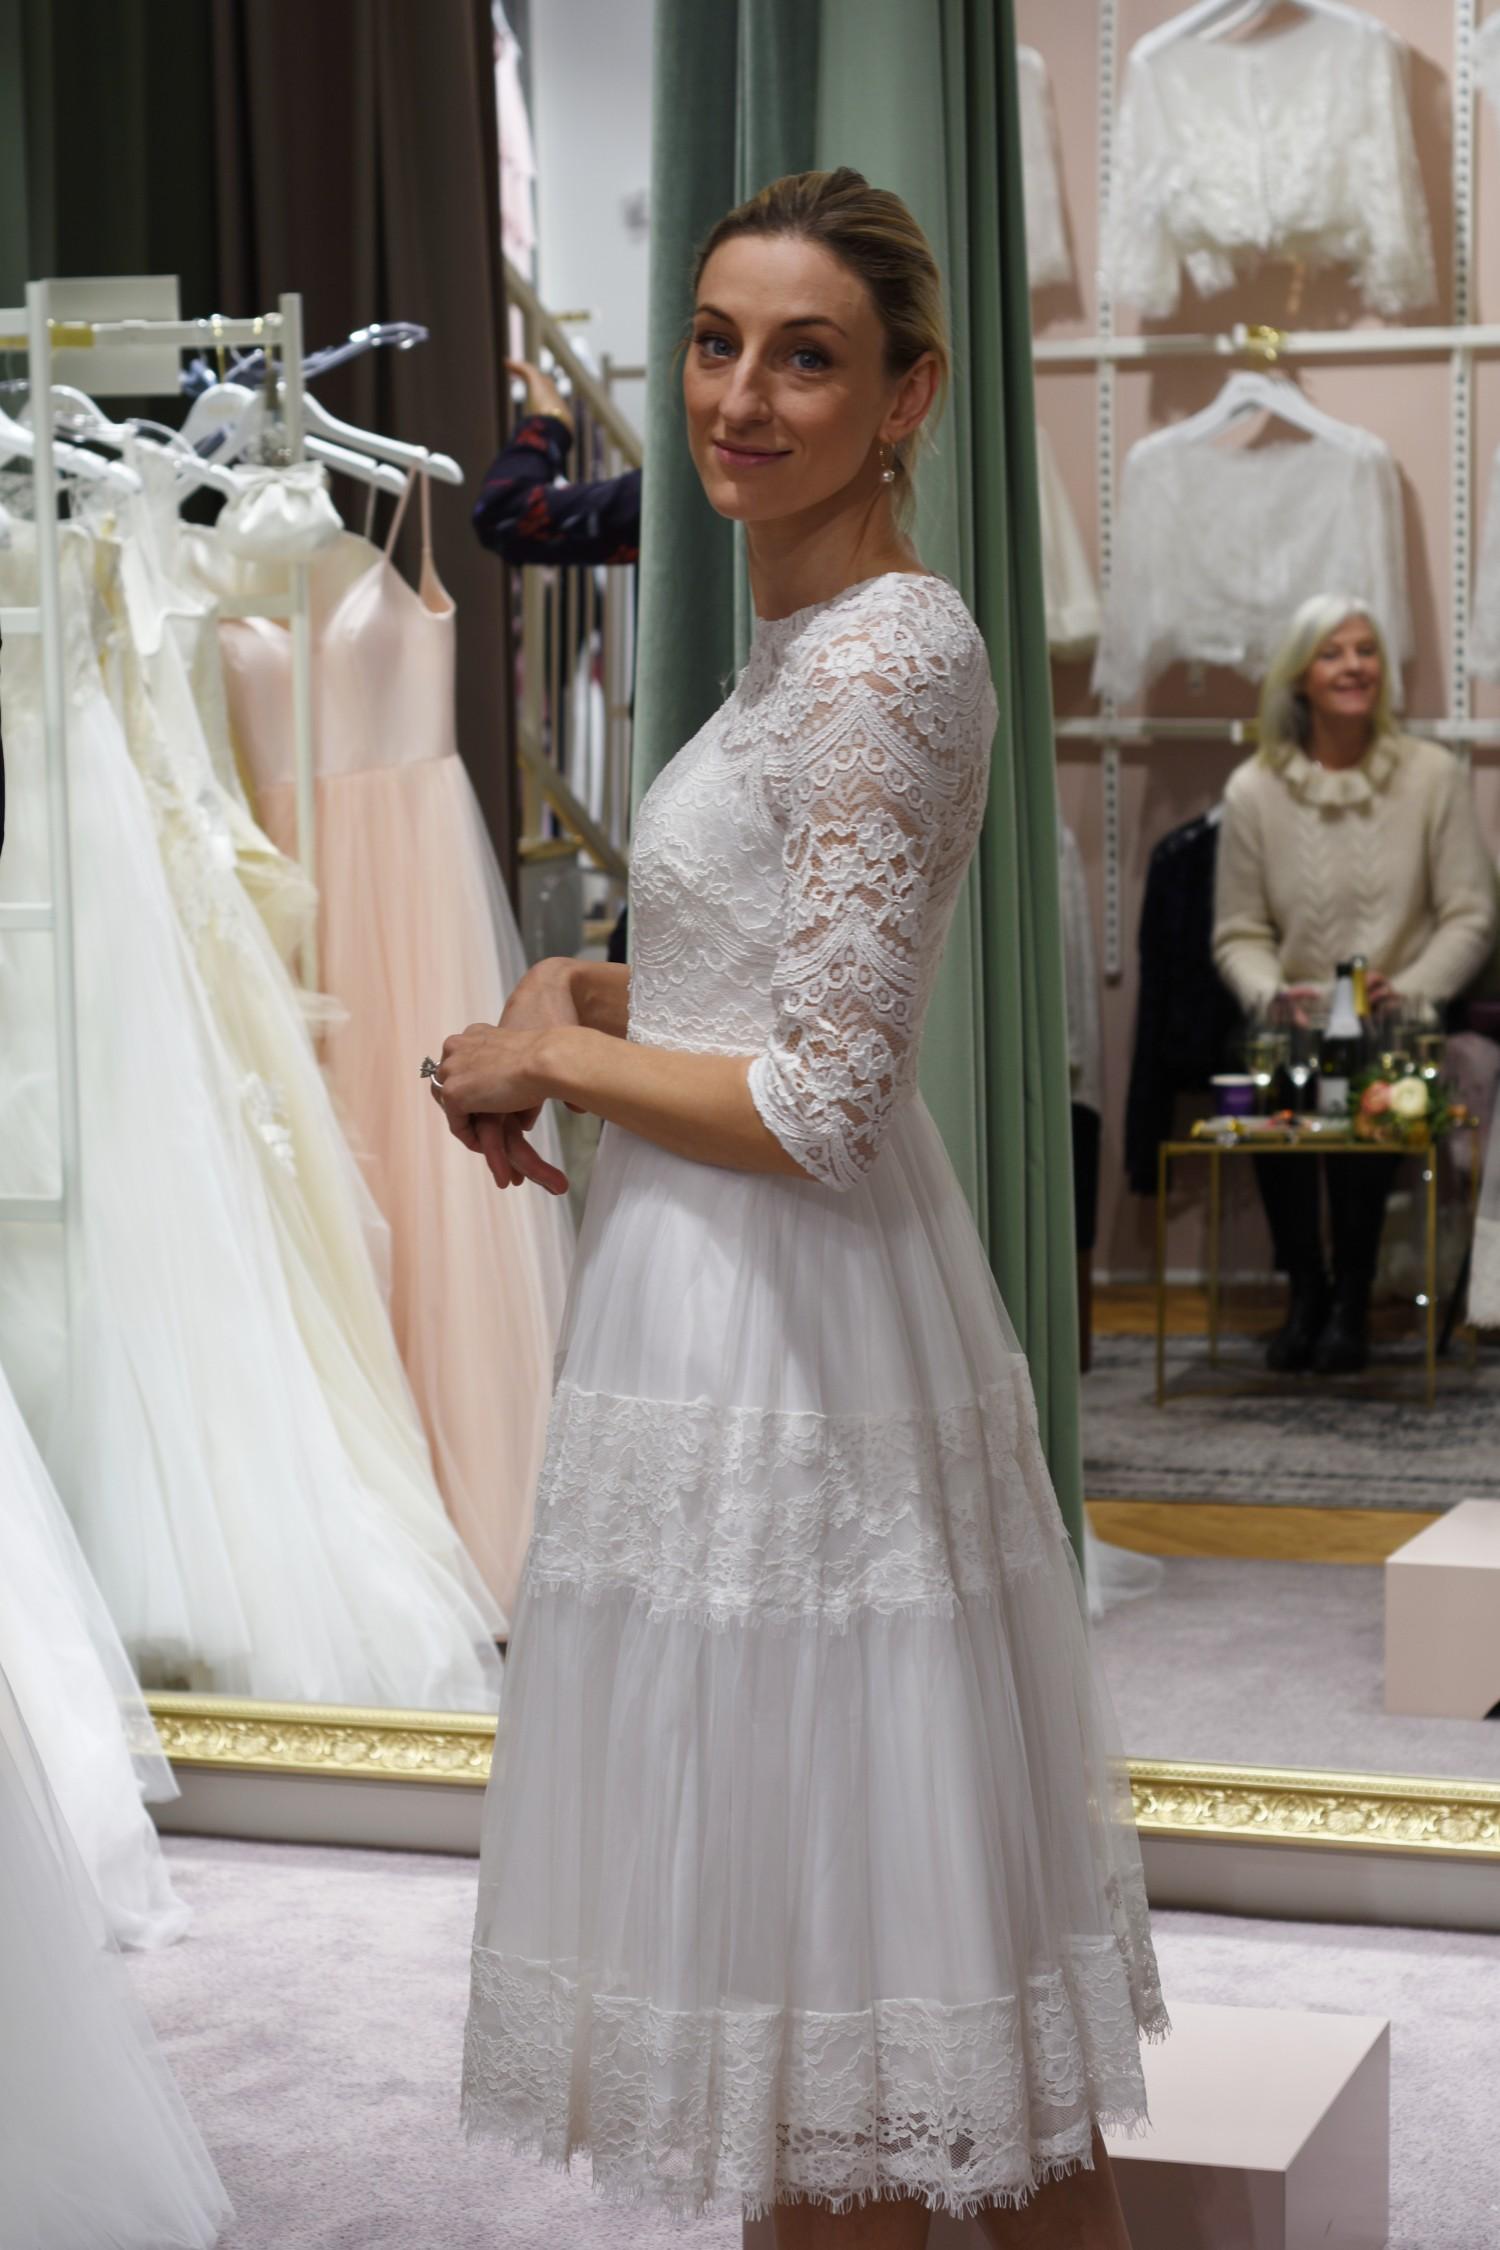 lilly-brudekjoler-annemette-voss-56